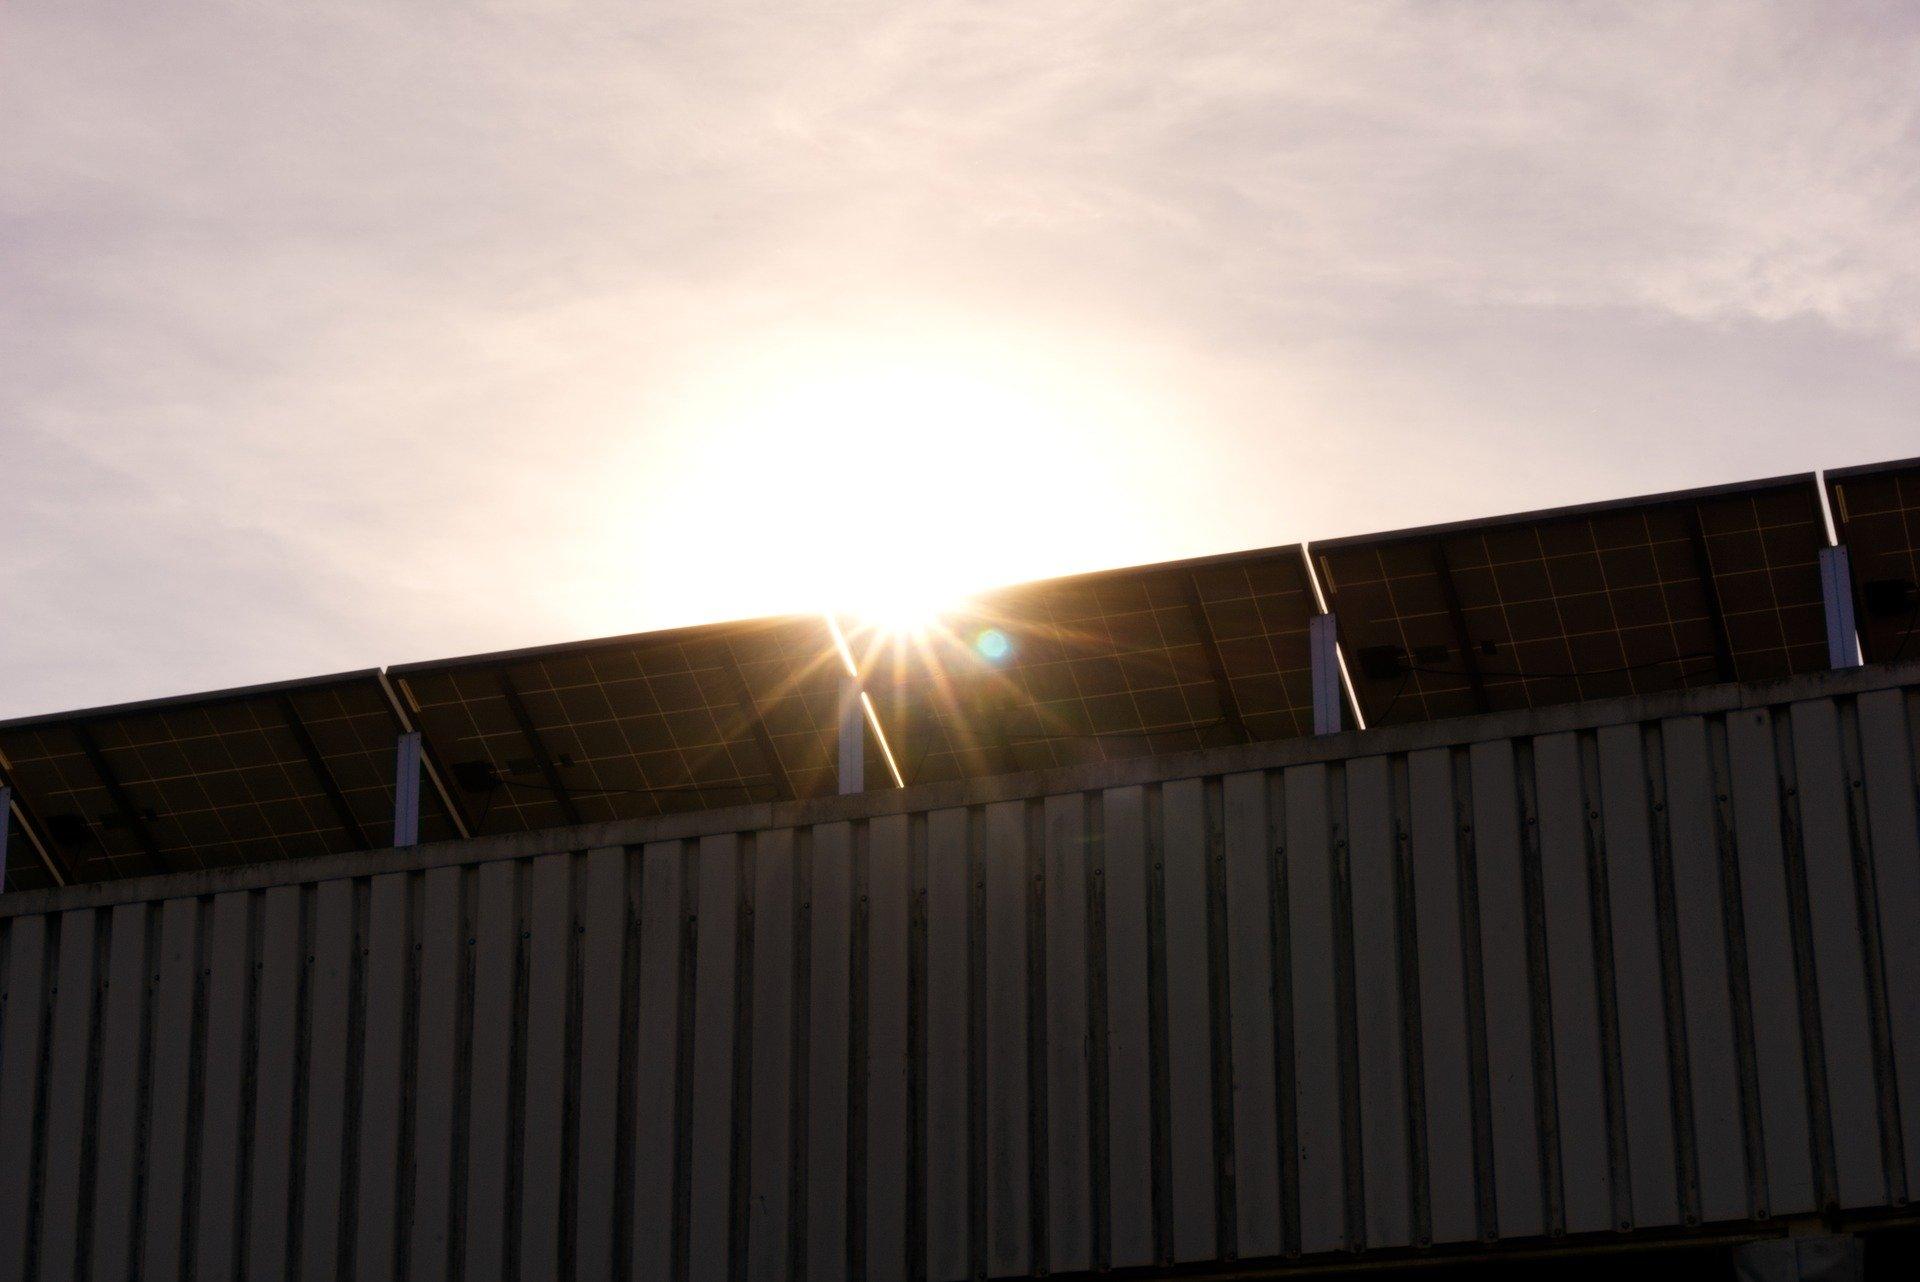 solar-cell-4106401_1920